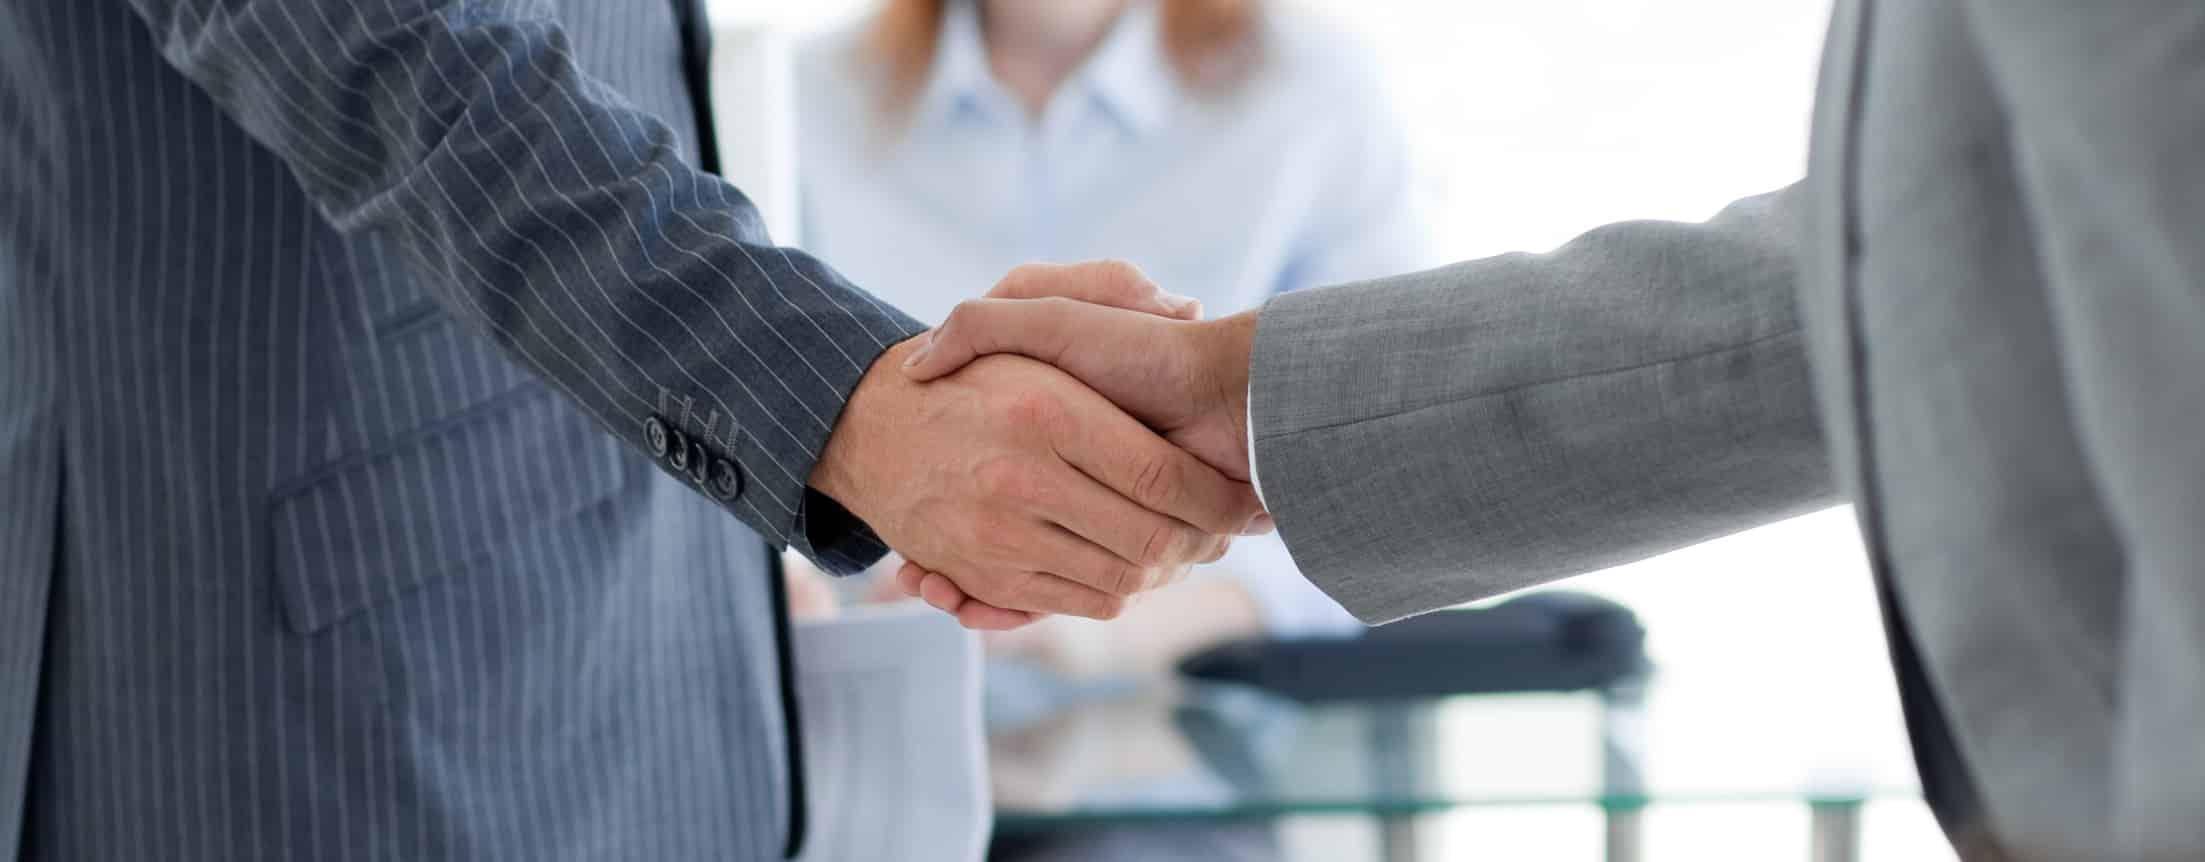 Signer un contrat de prestation